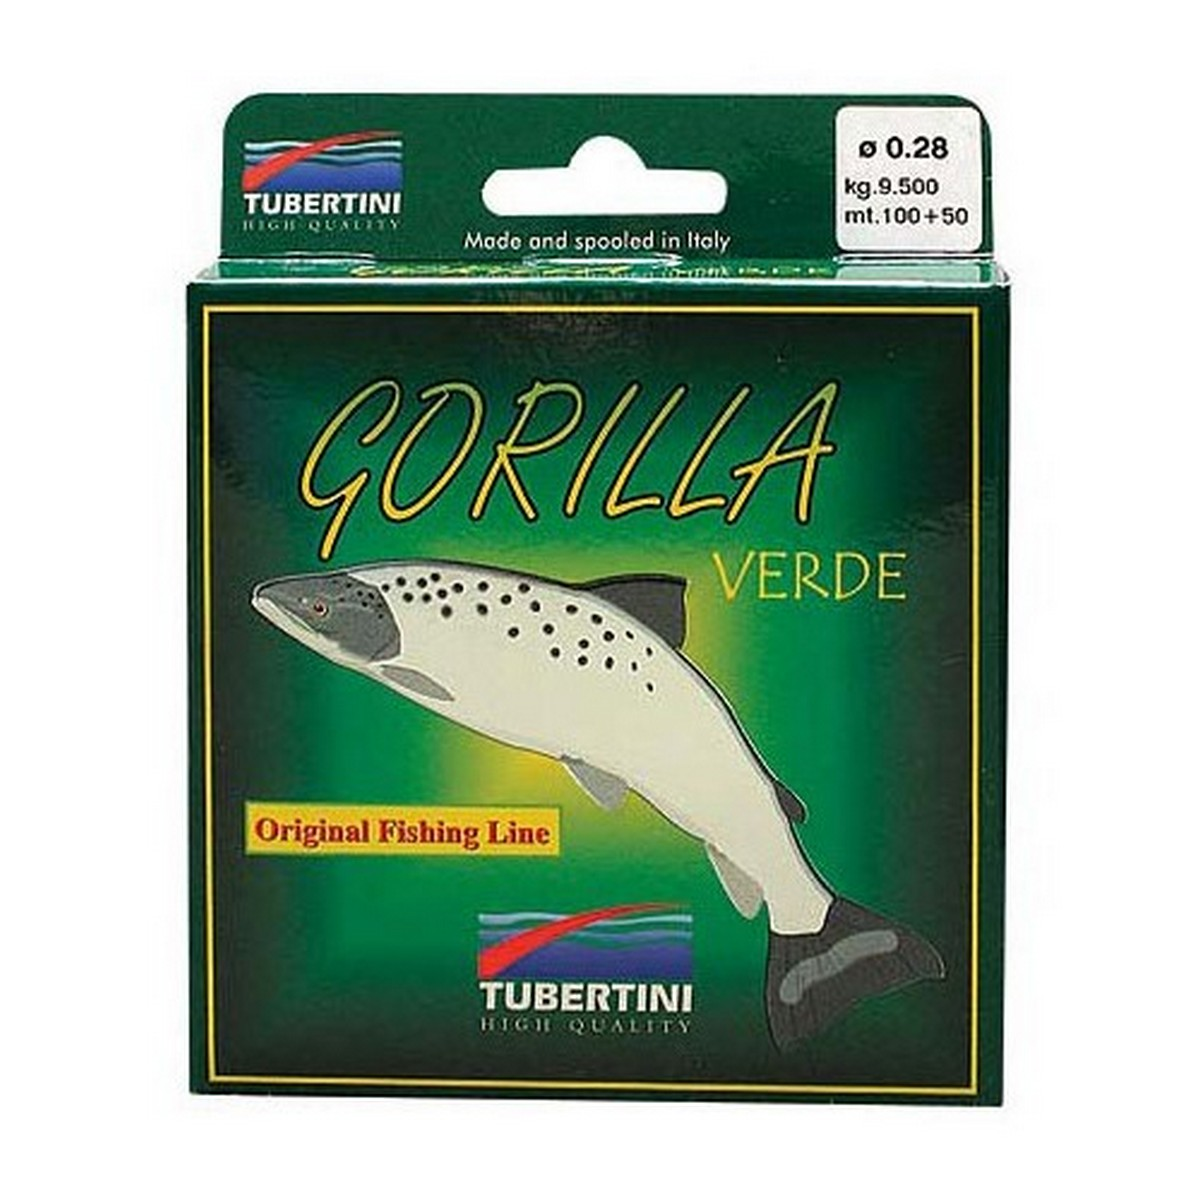 Tubertini Gorilla Verde